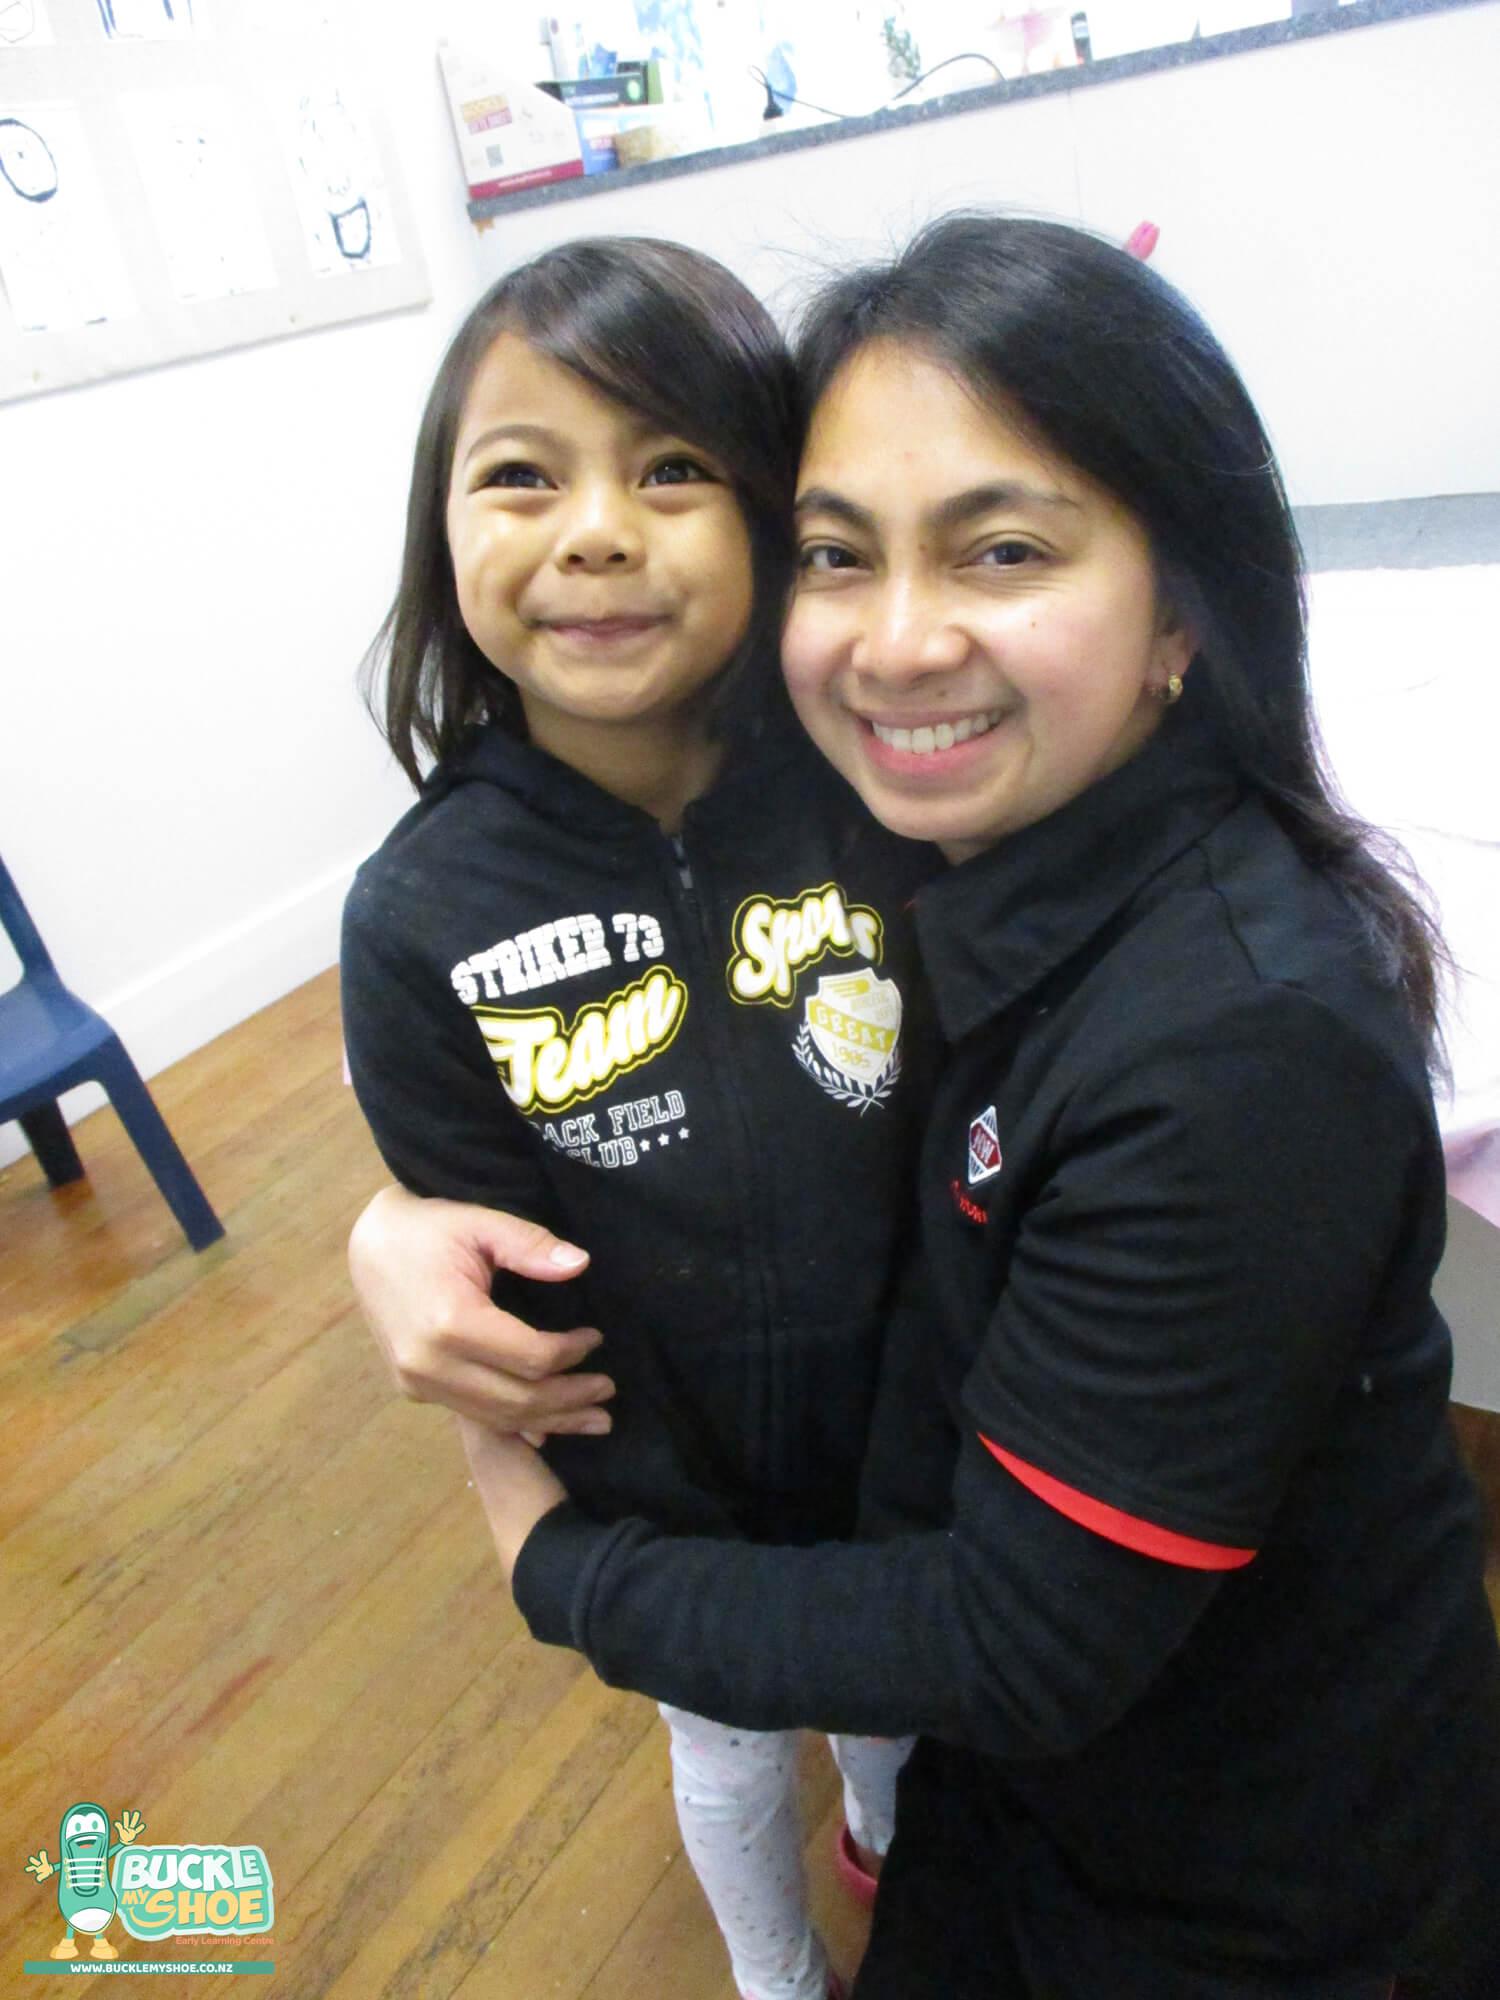 buckle-my-shoe-ece-childcare-tauranga-mothers-day-6.jpg